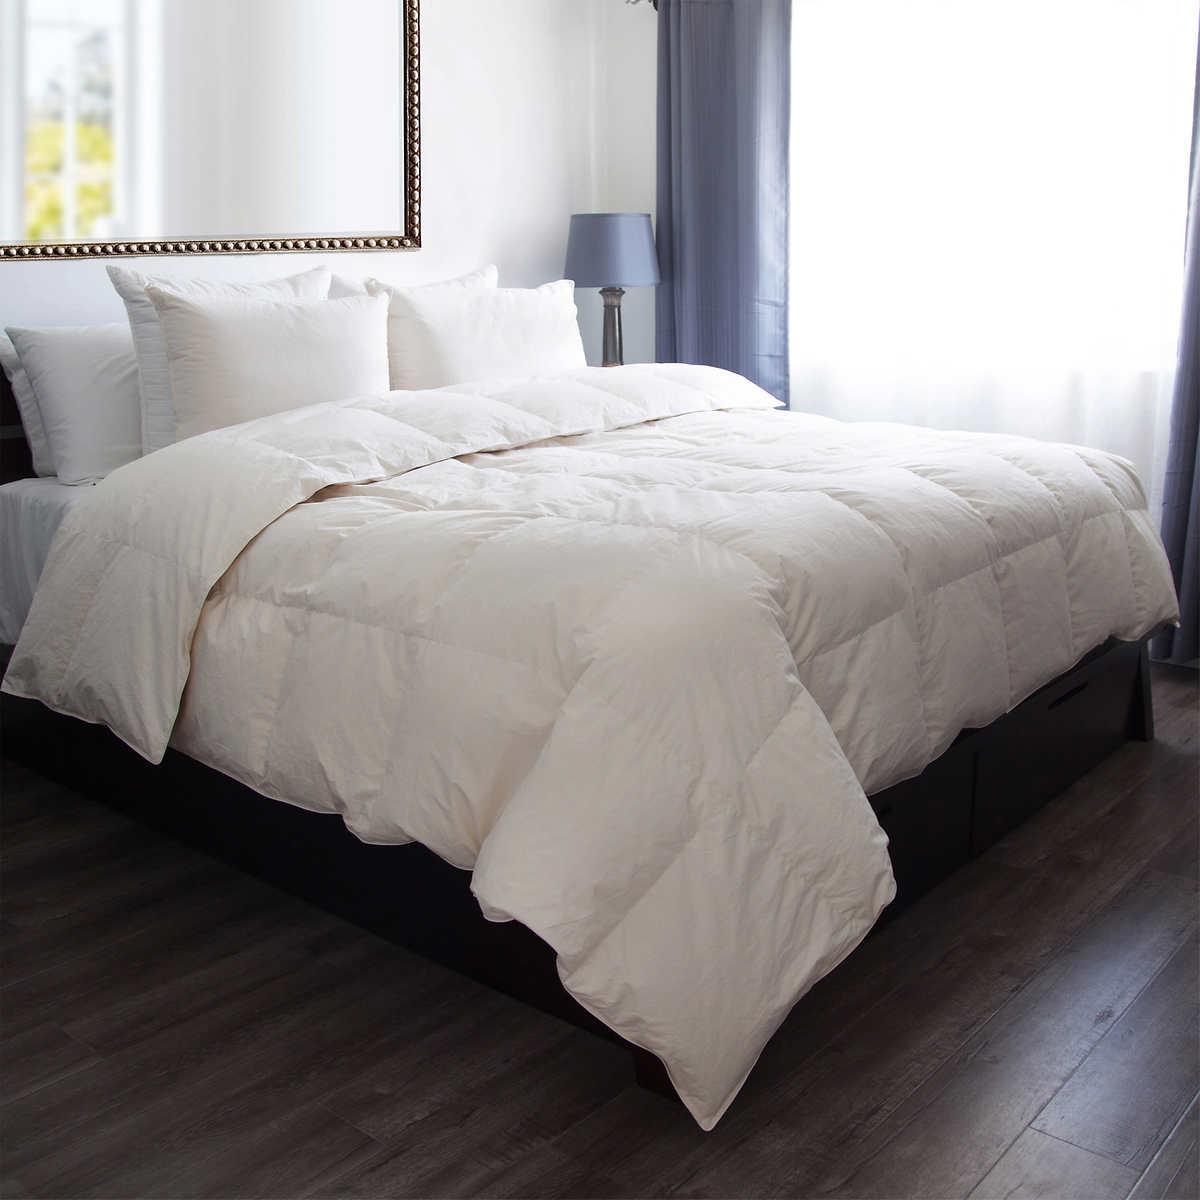 sheet naturally sleep set mysheet cotton bedding luxury comfortable comforter sets organic category product